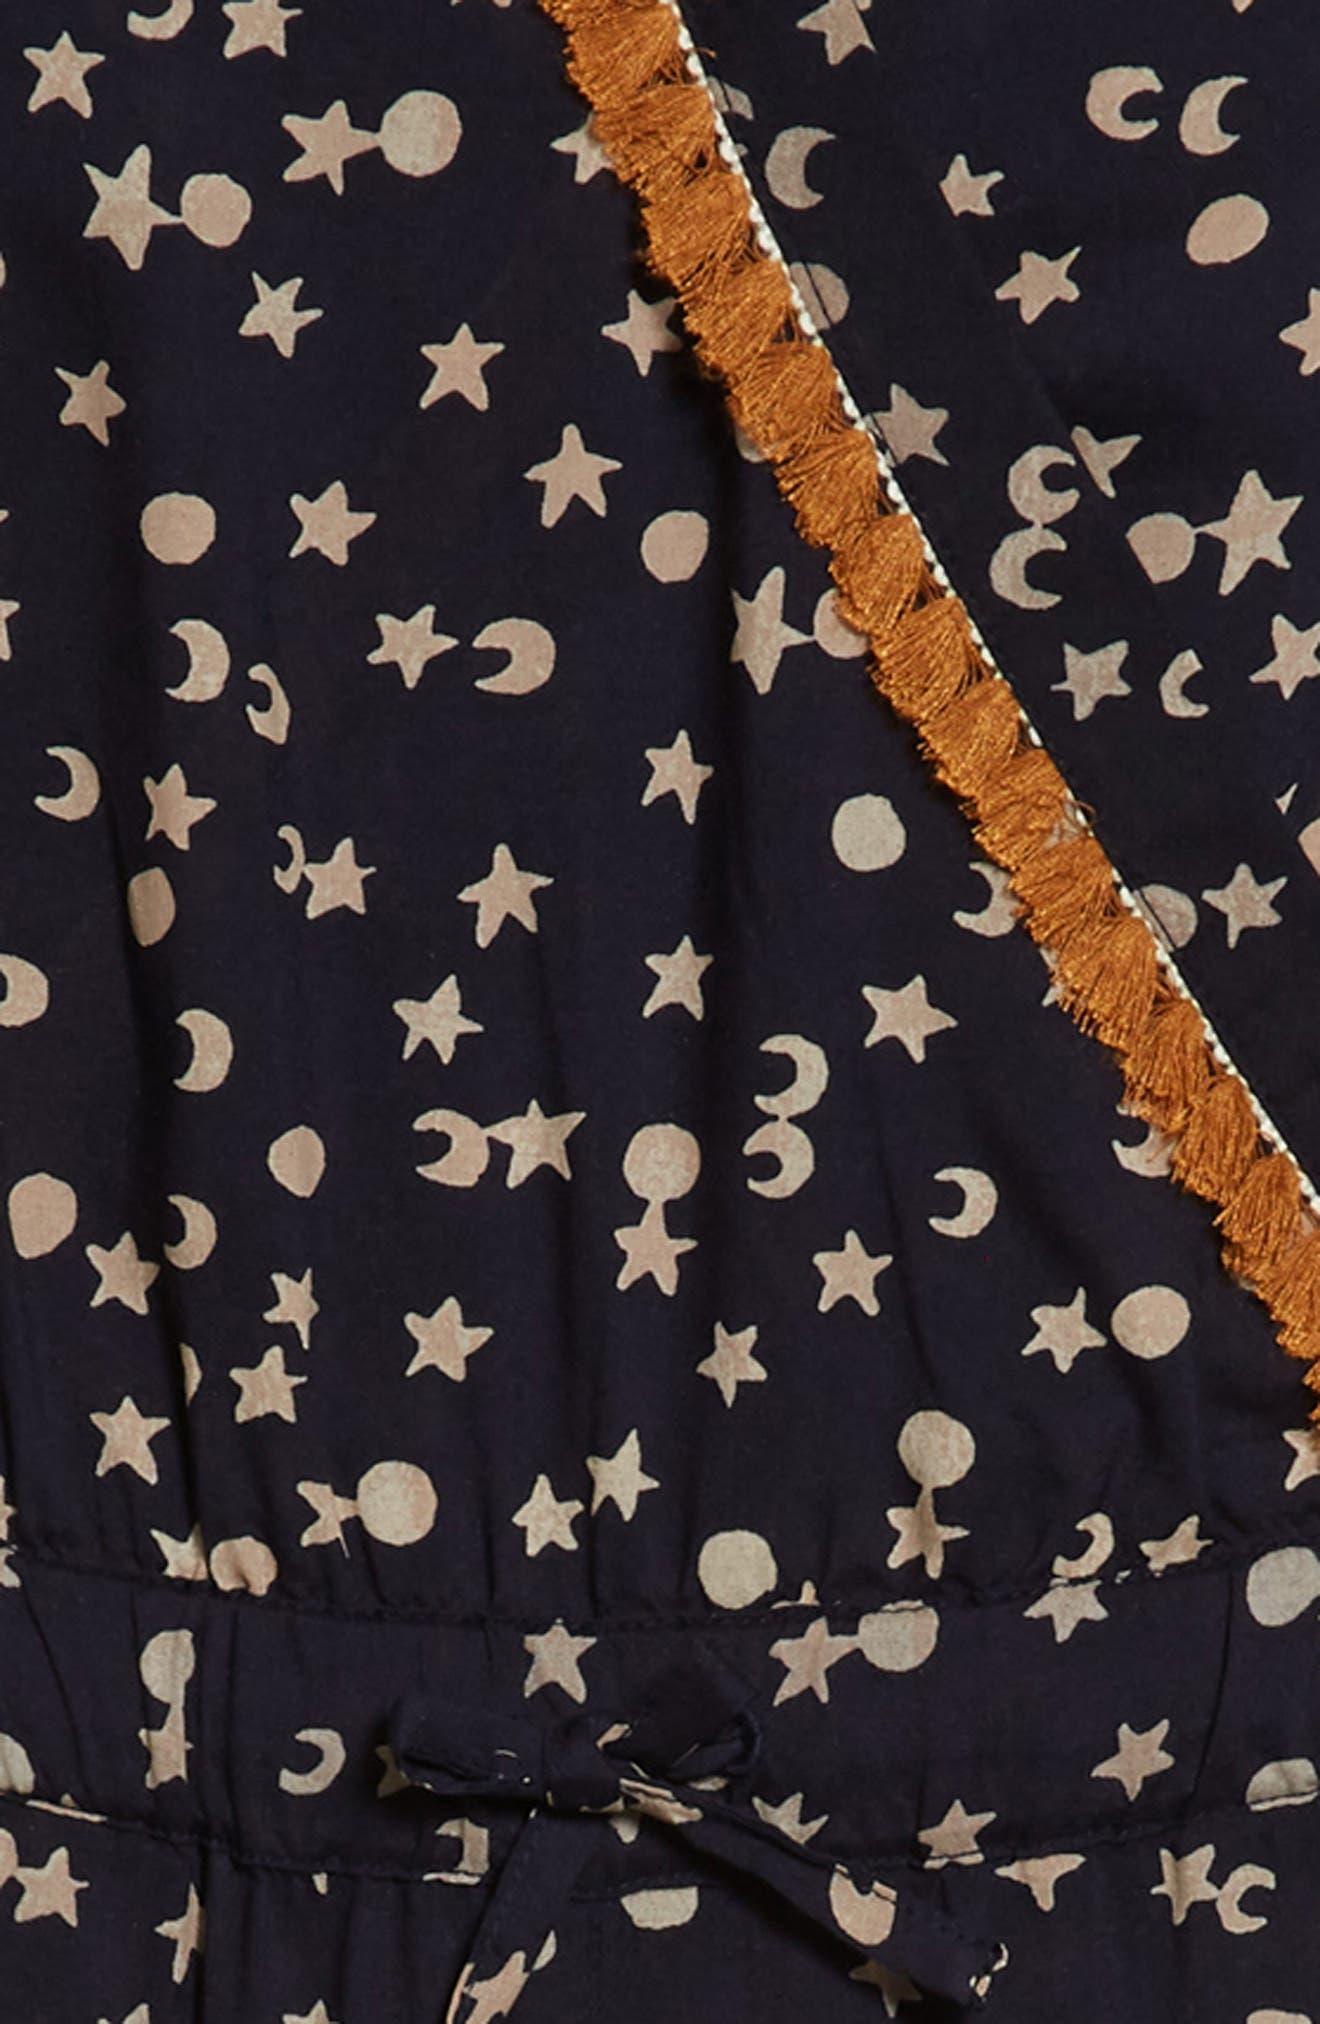 Scotch R'Belle Moon & Star Fringe Jumpsuit,                             Alternate thumbnail 2, color,                             Navy Print